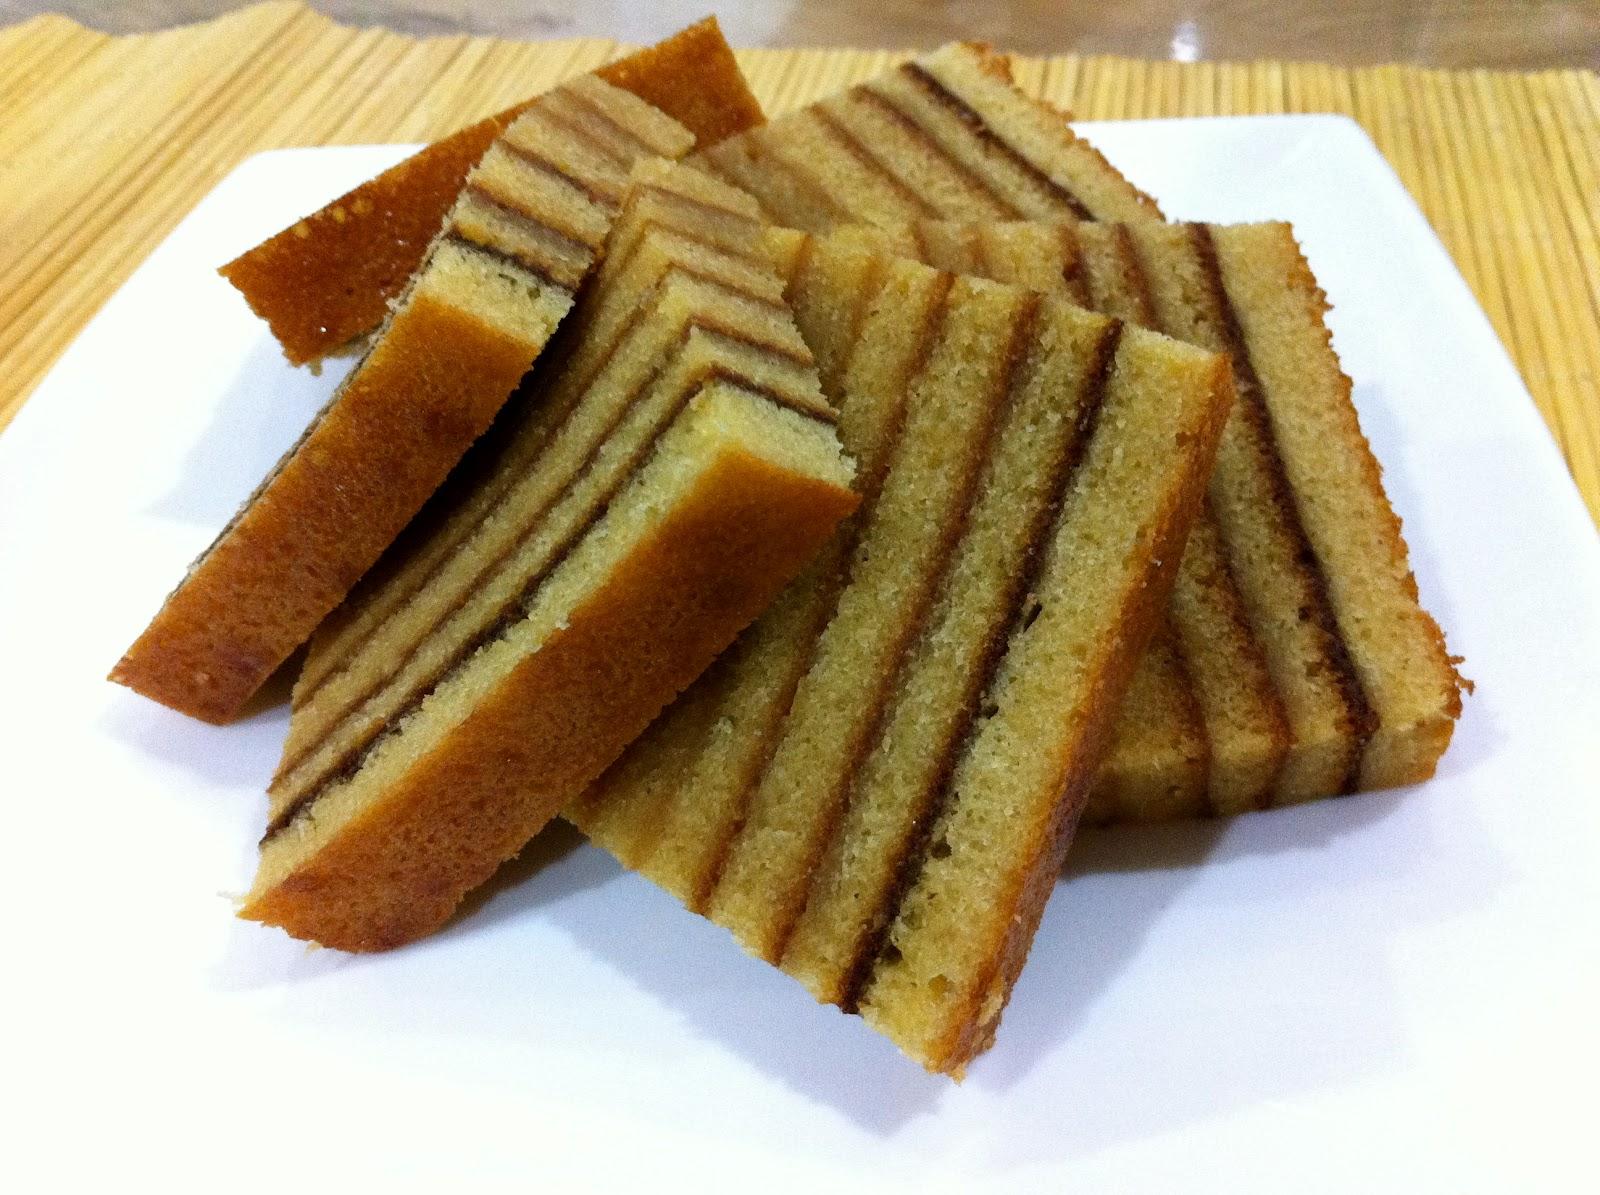 sarawak cake - photo #21